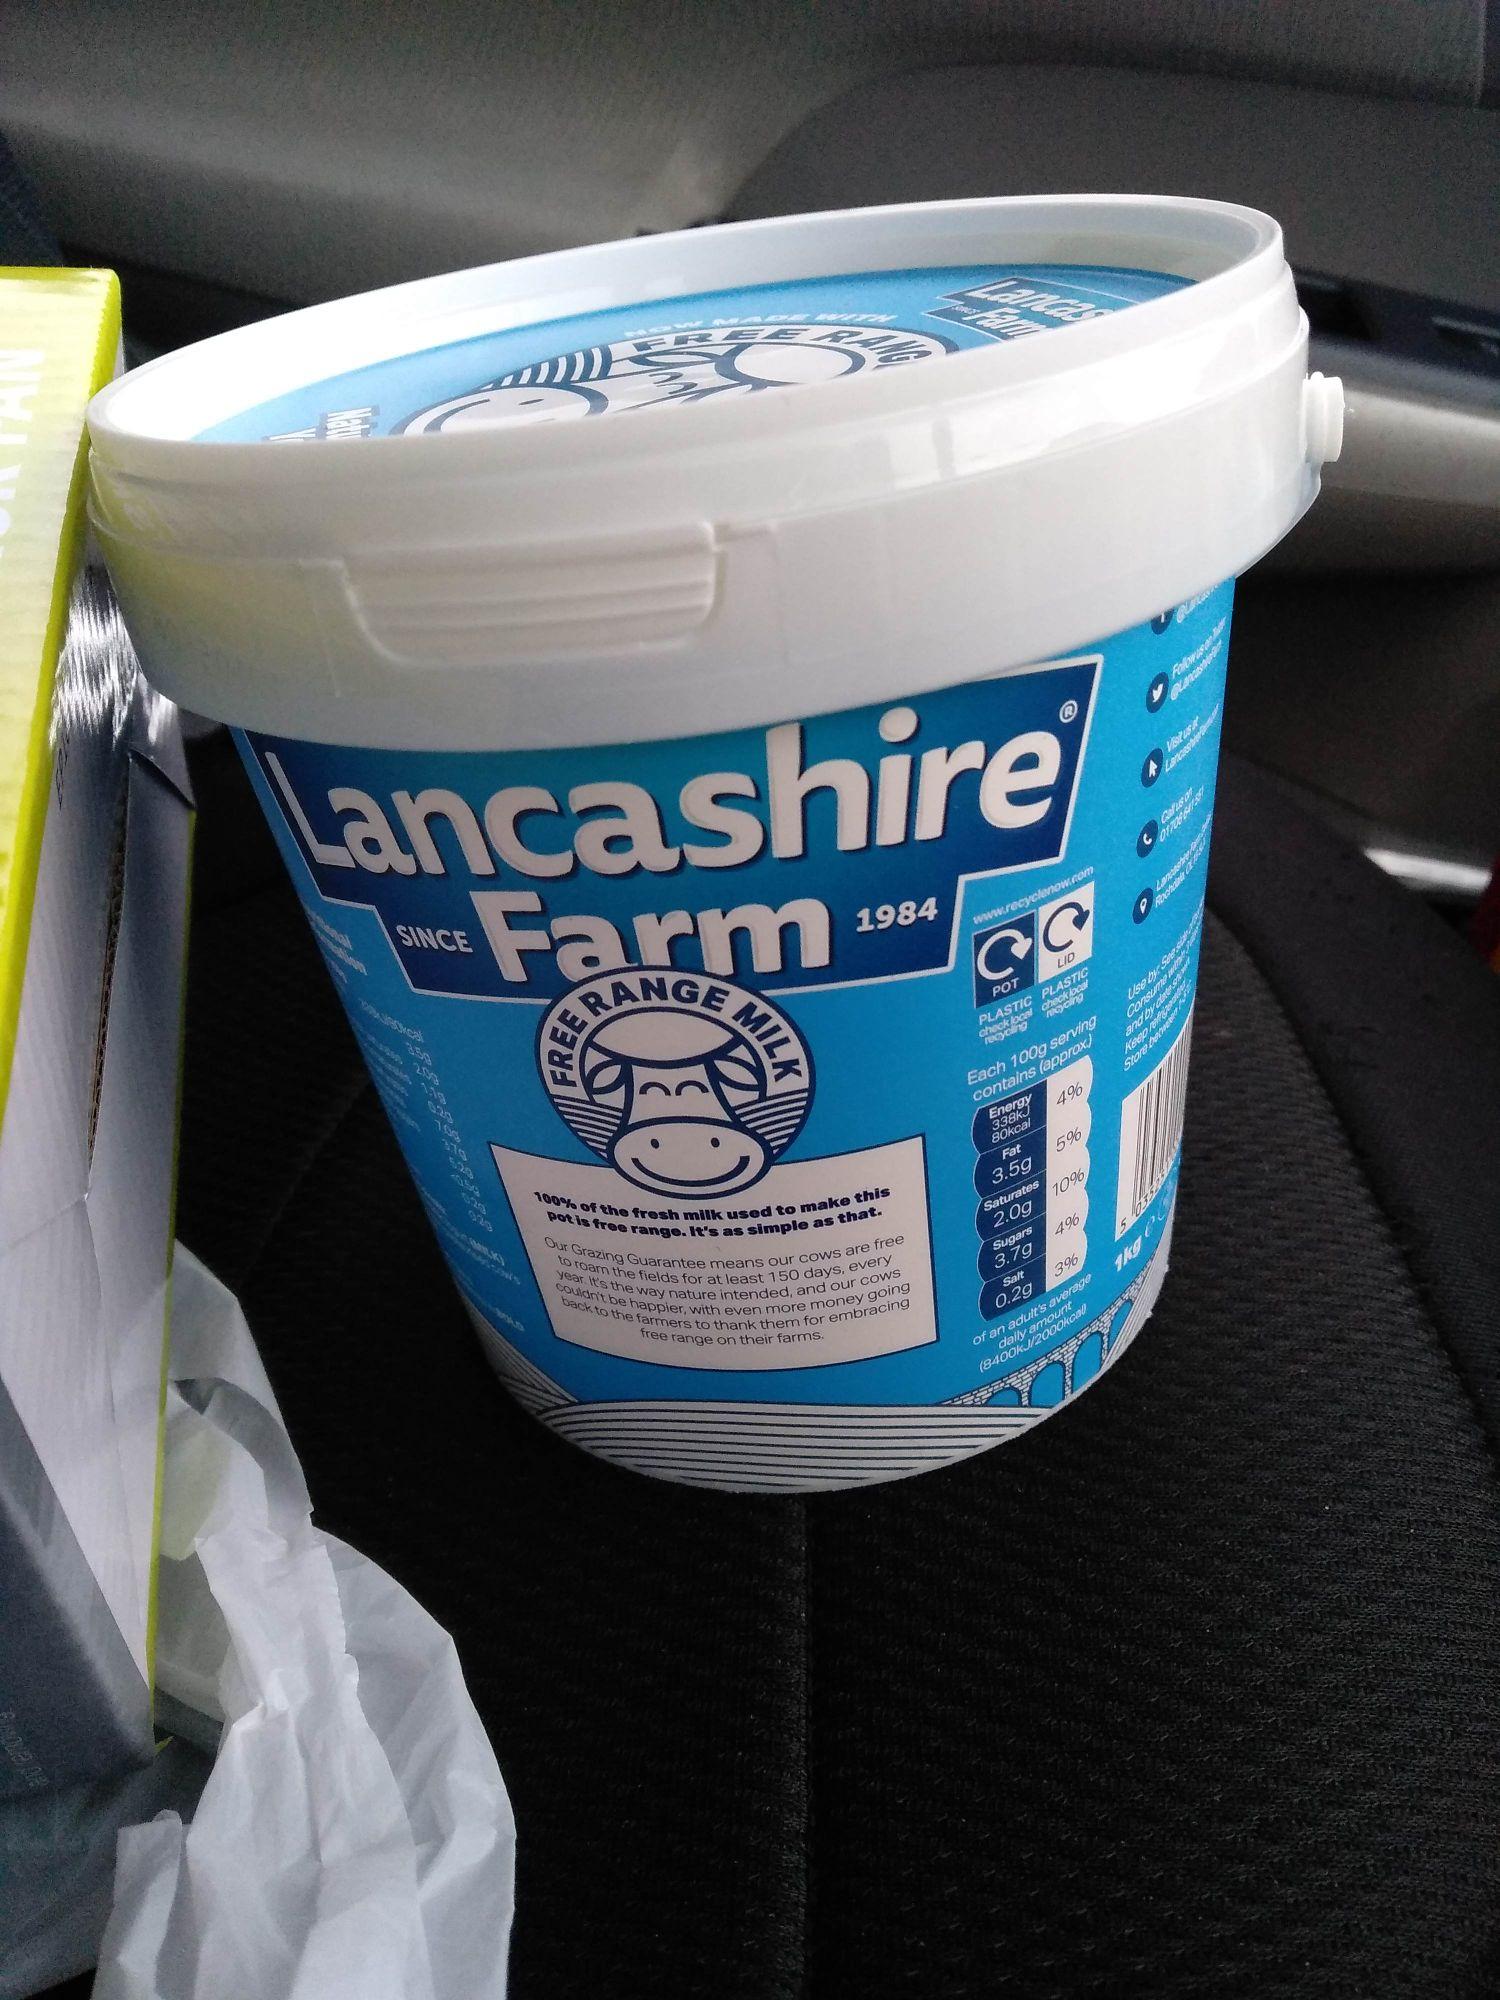 Lancashire Farm Yogurt (1ltr) 62p in ASDA instore